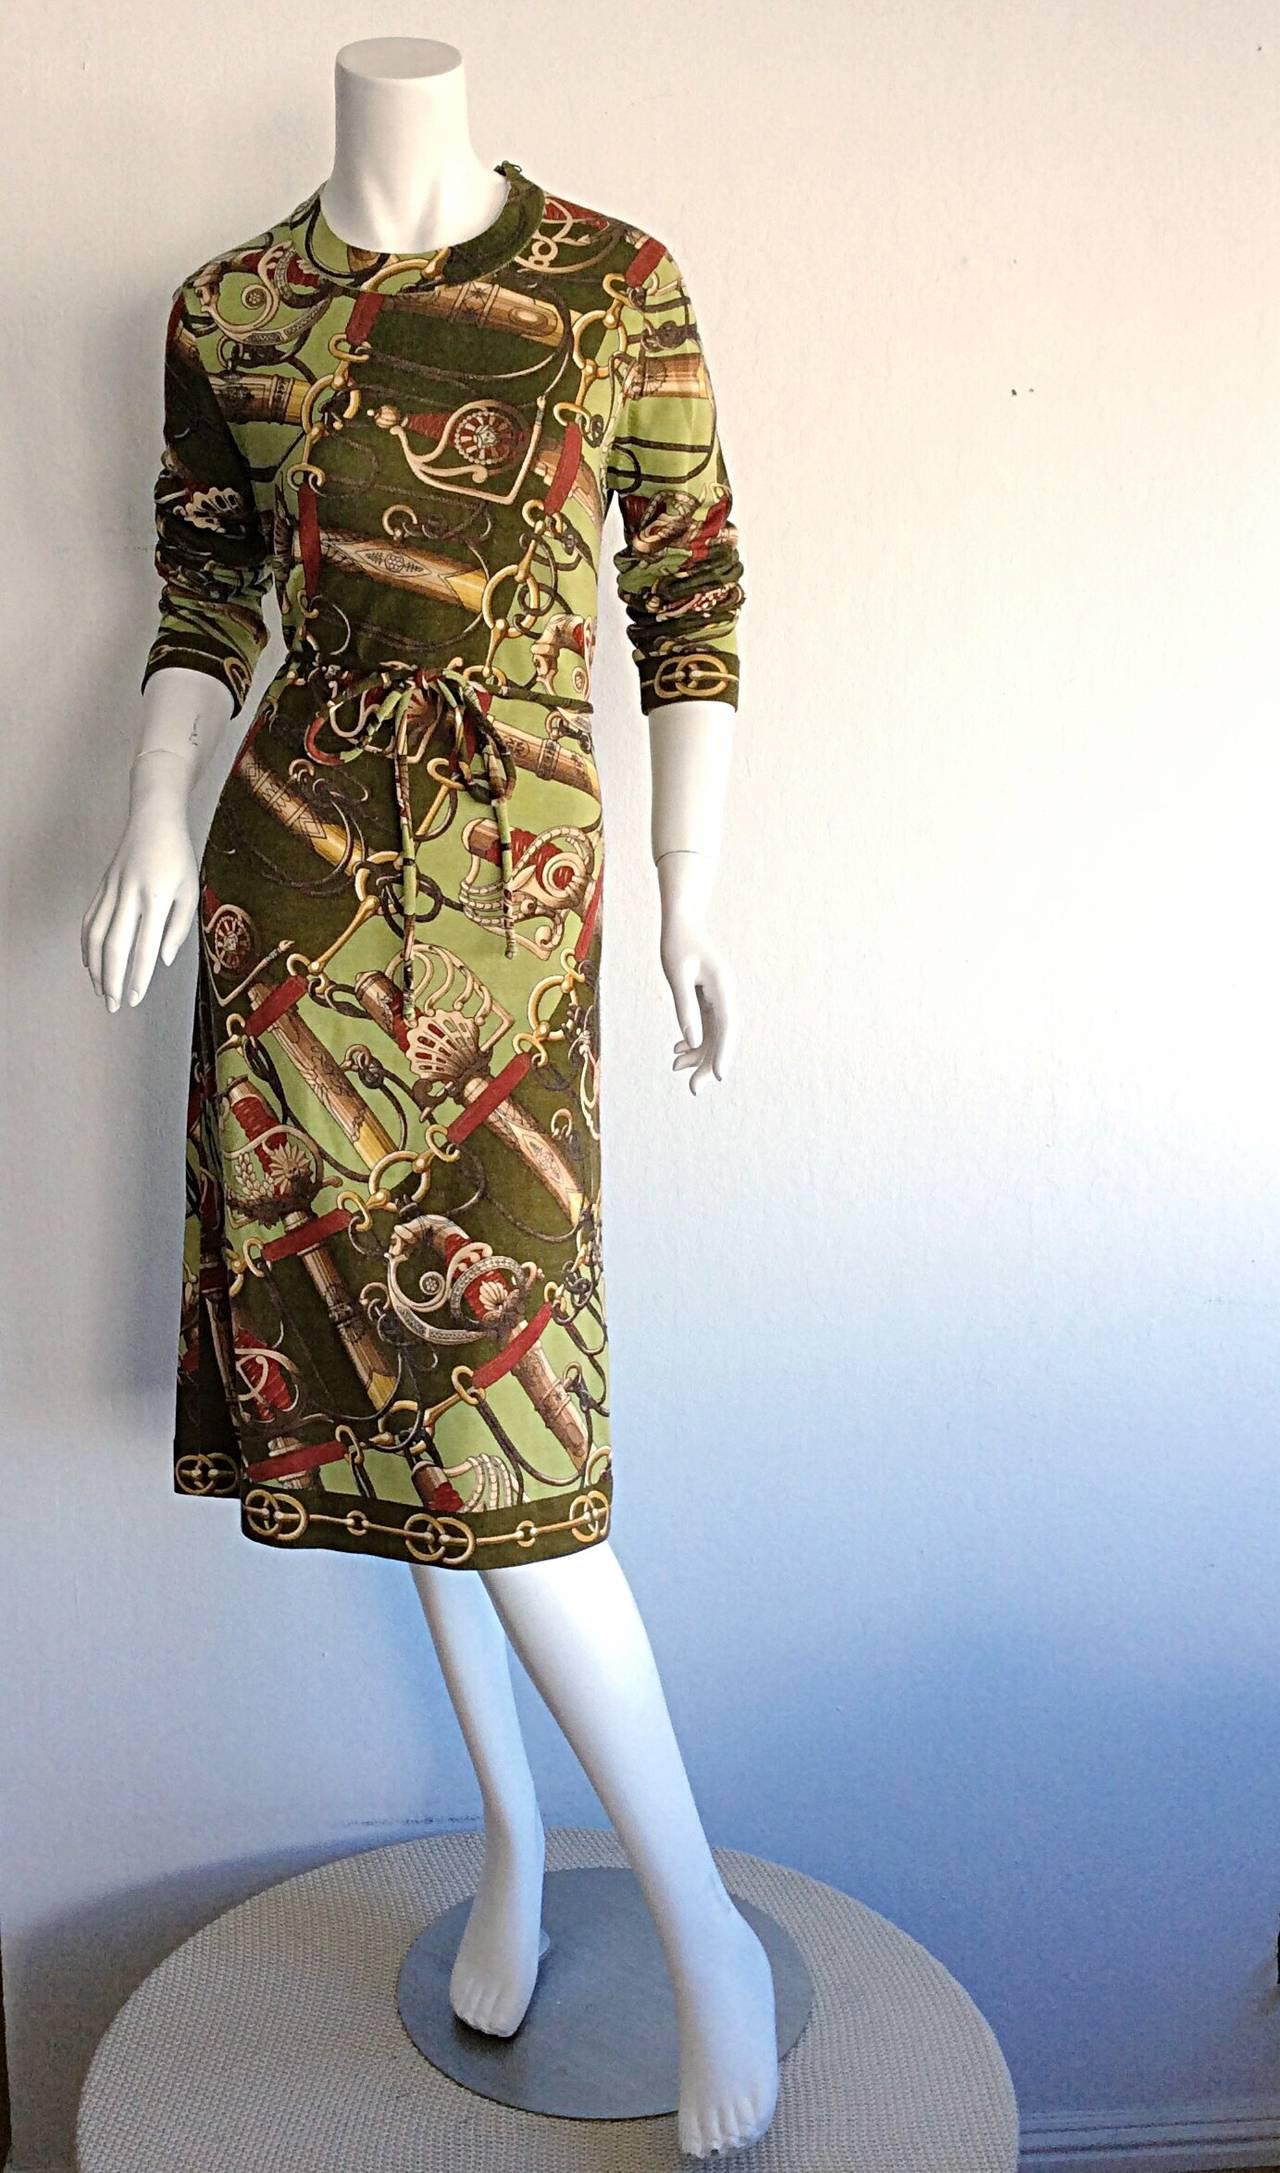 Incredible Vintage Hermes Sweater Dress And Belt At 1stdibs